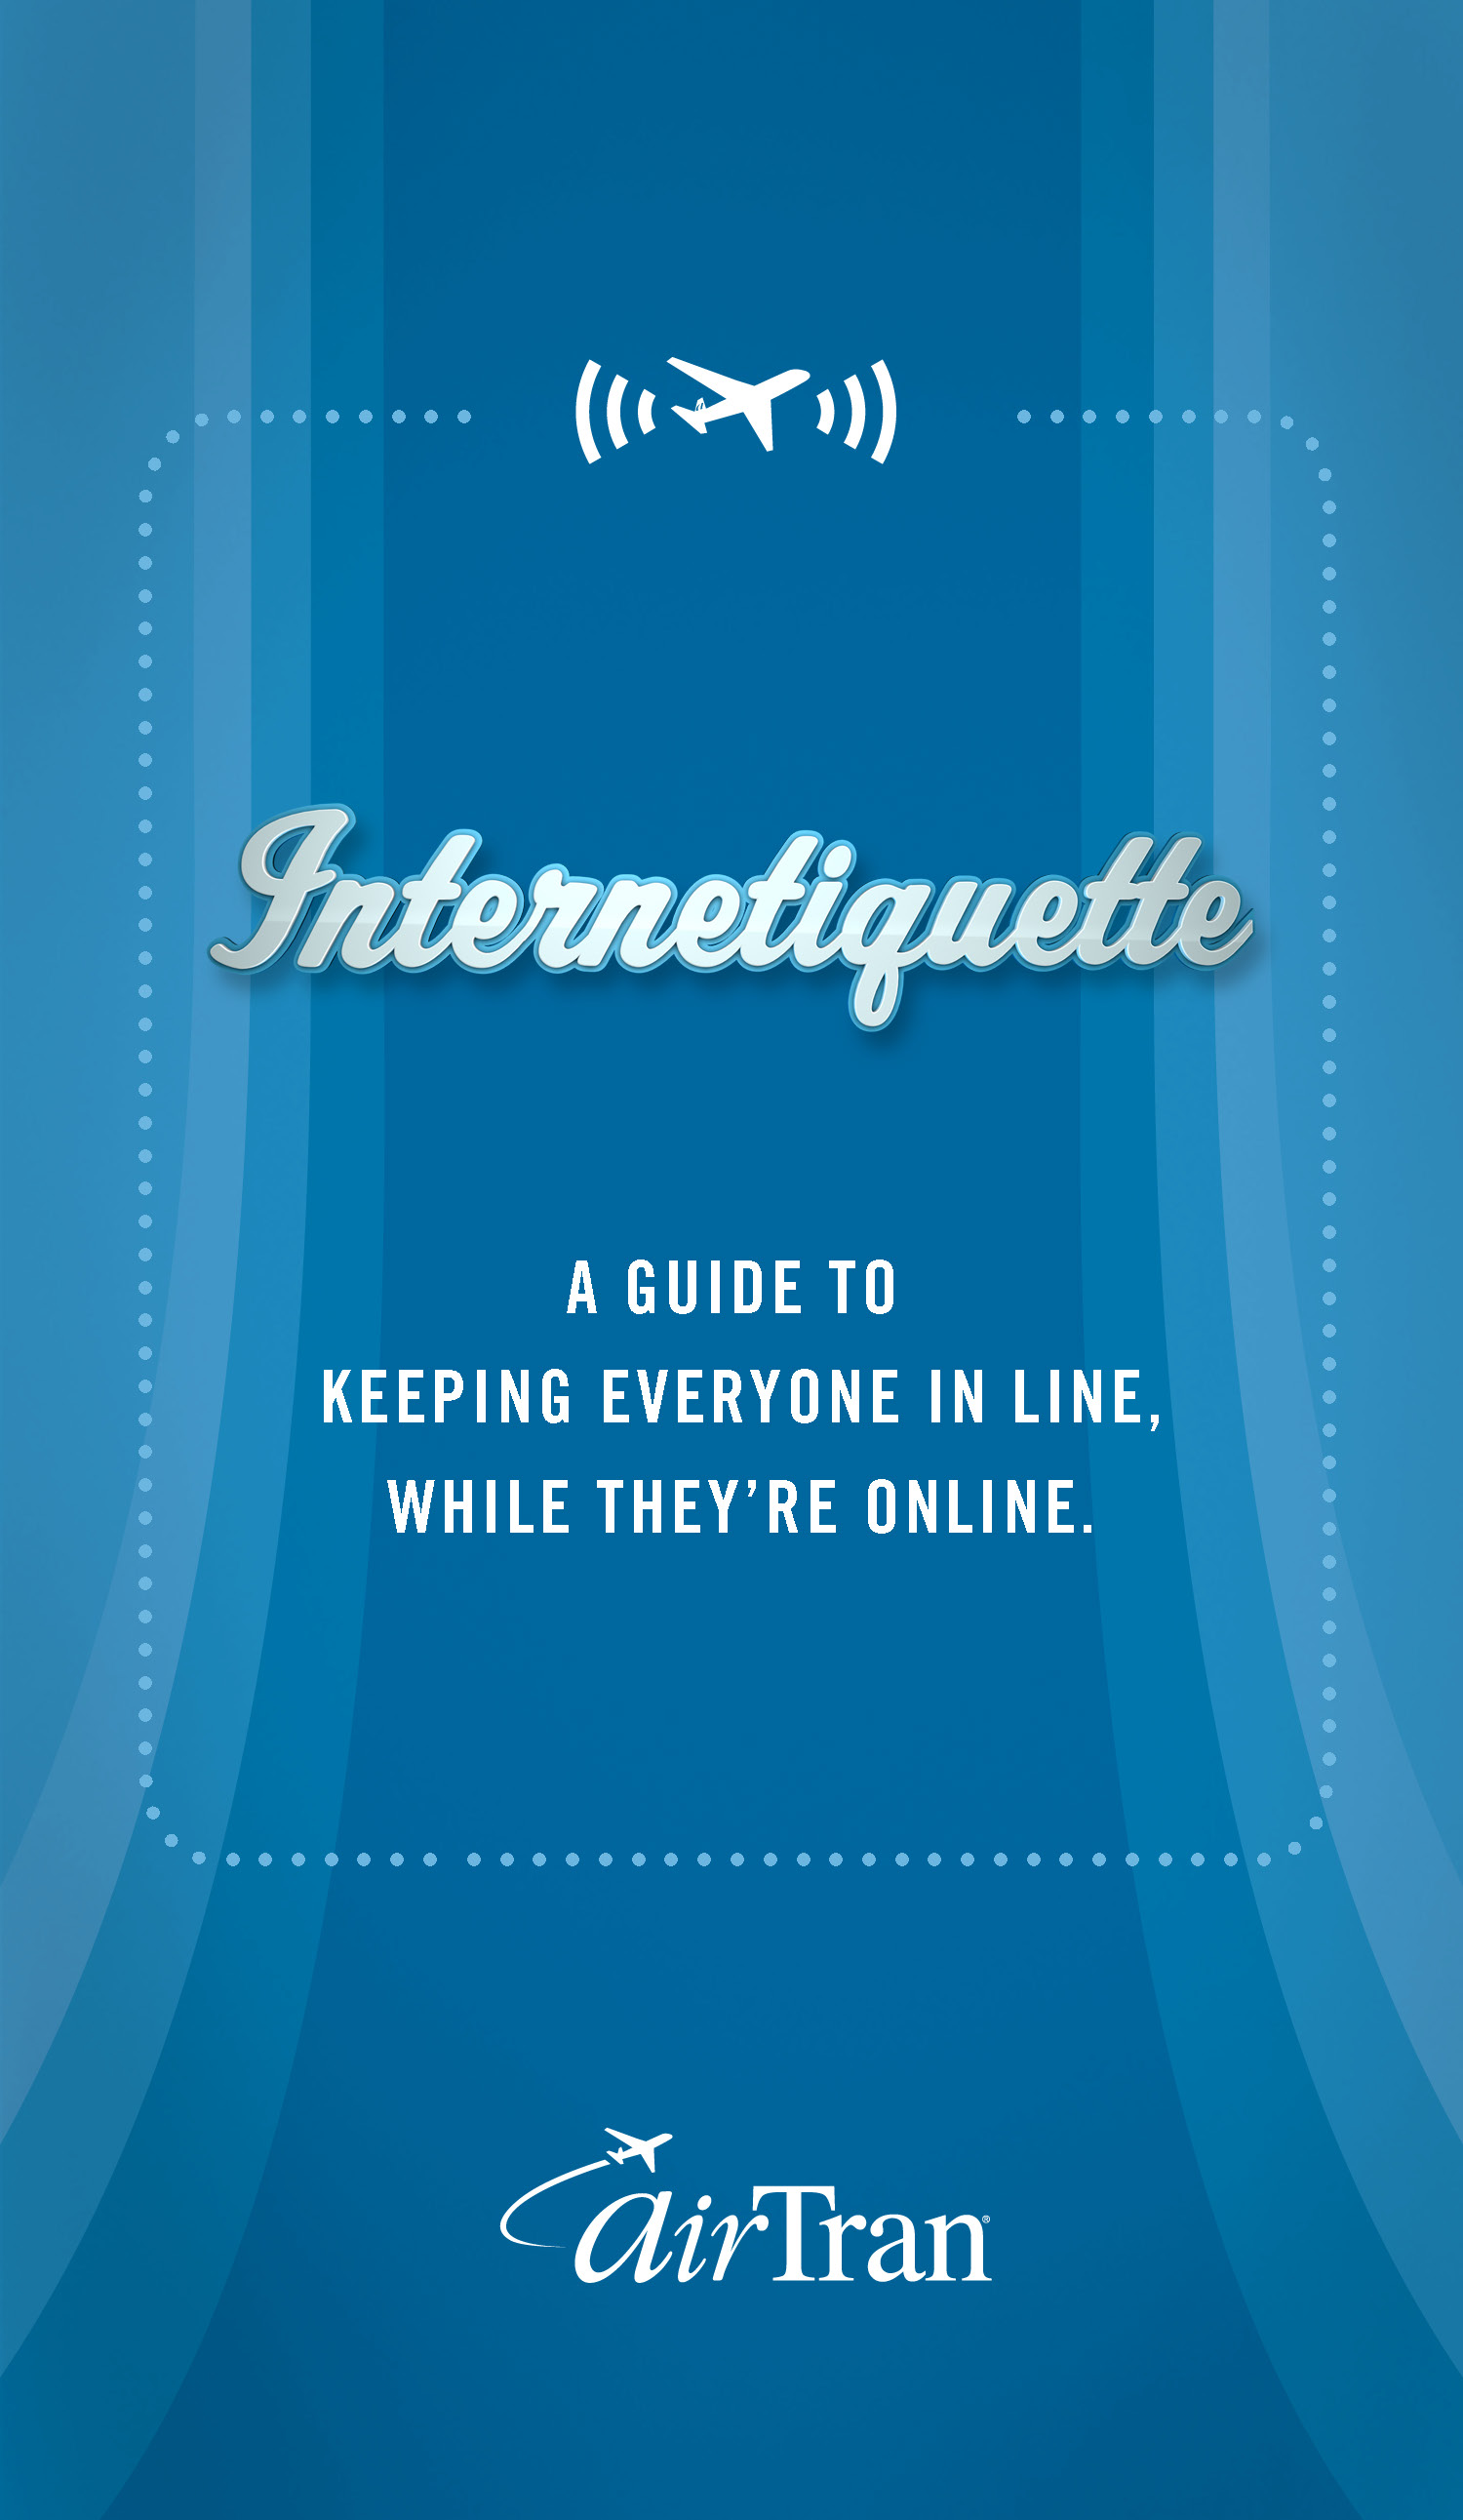 internetiquette brochure cover